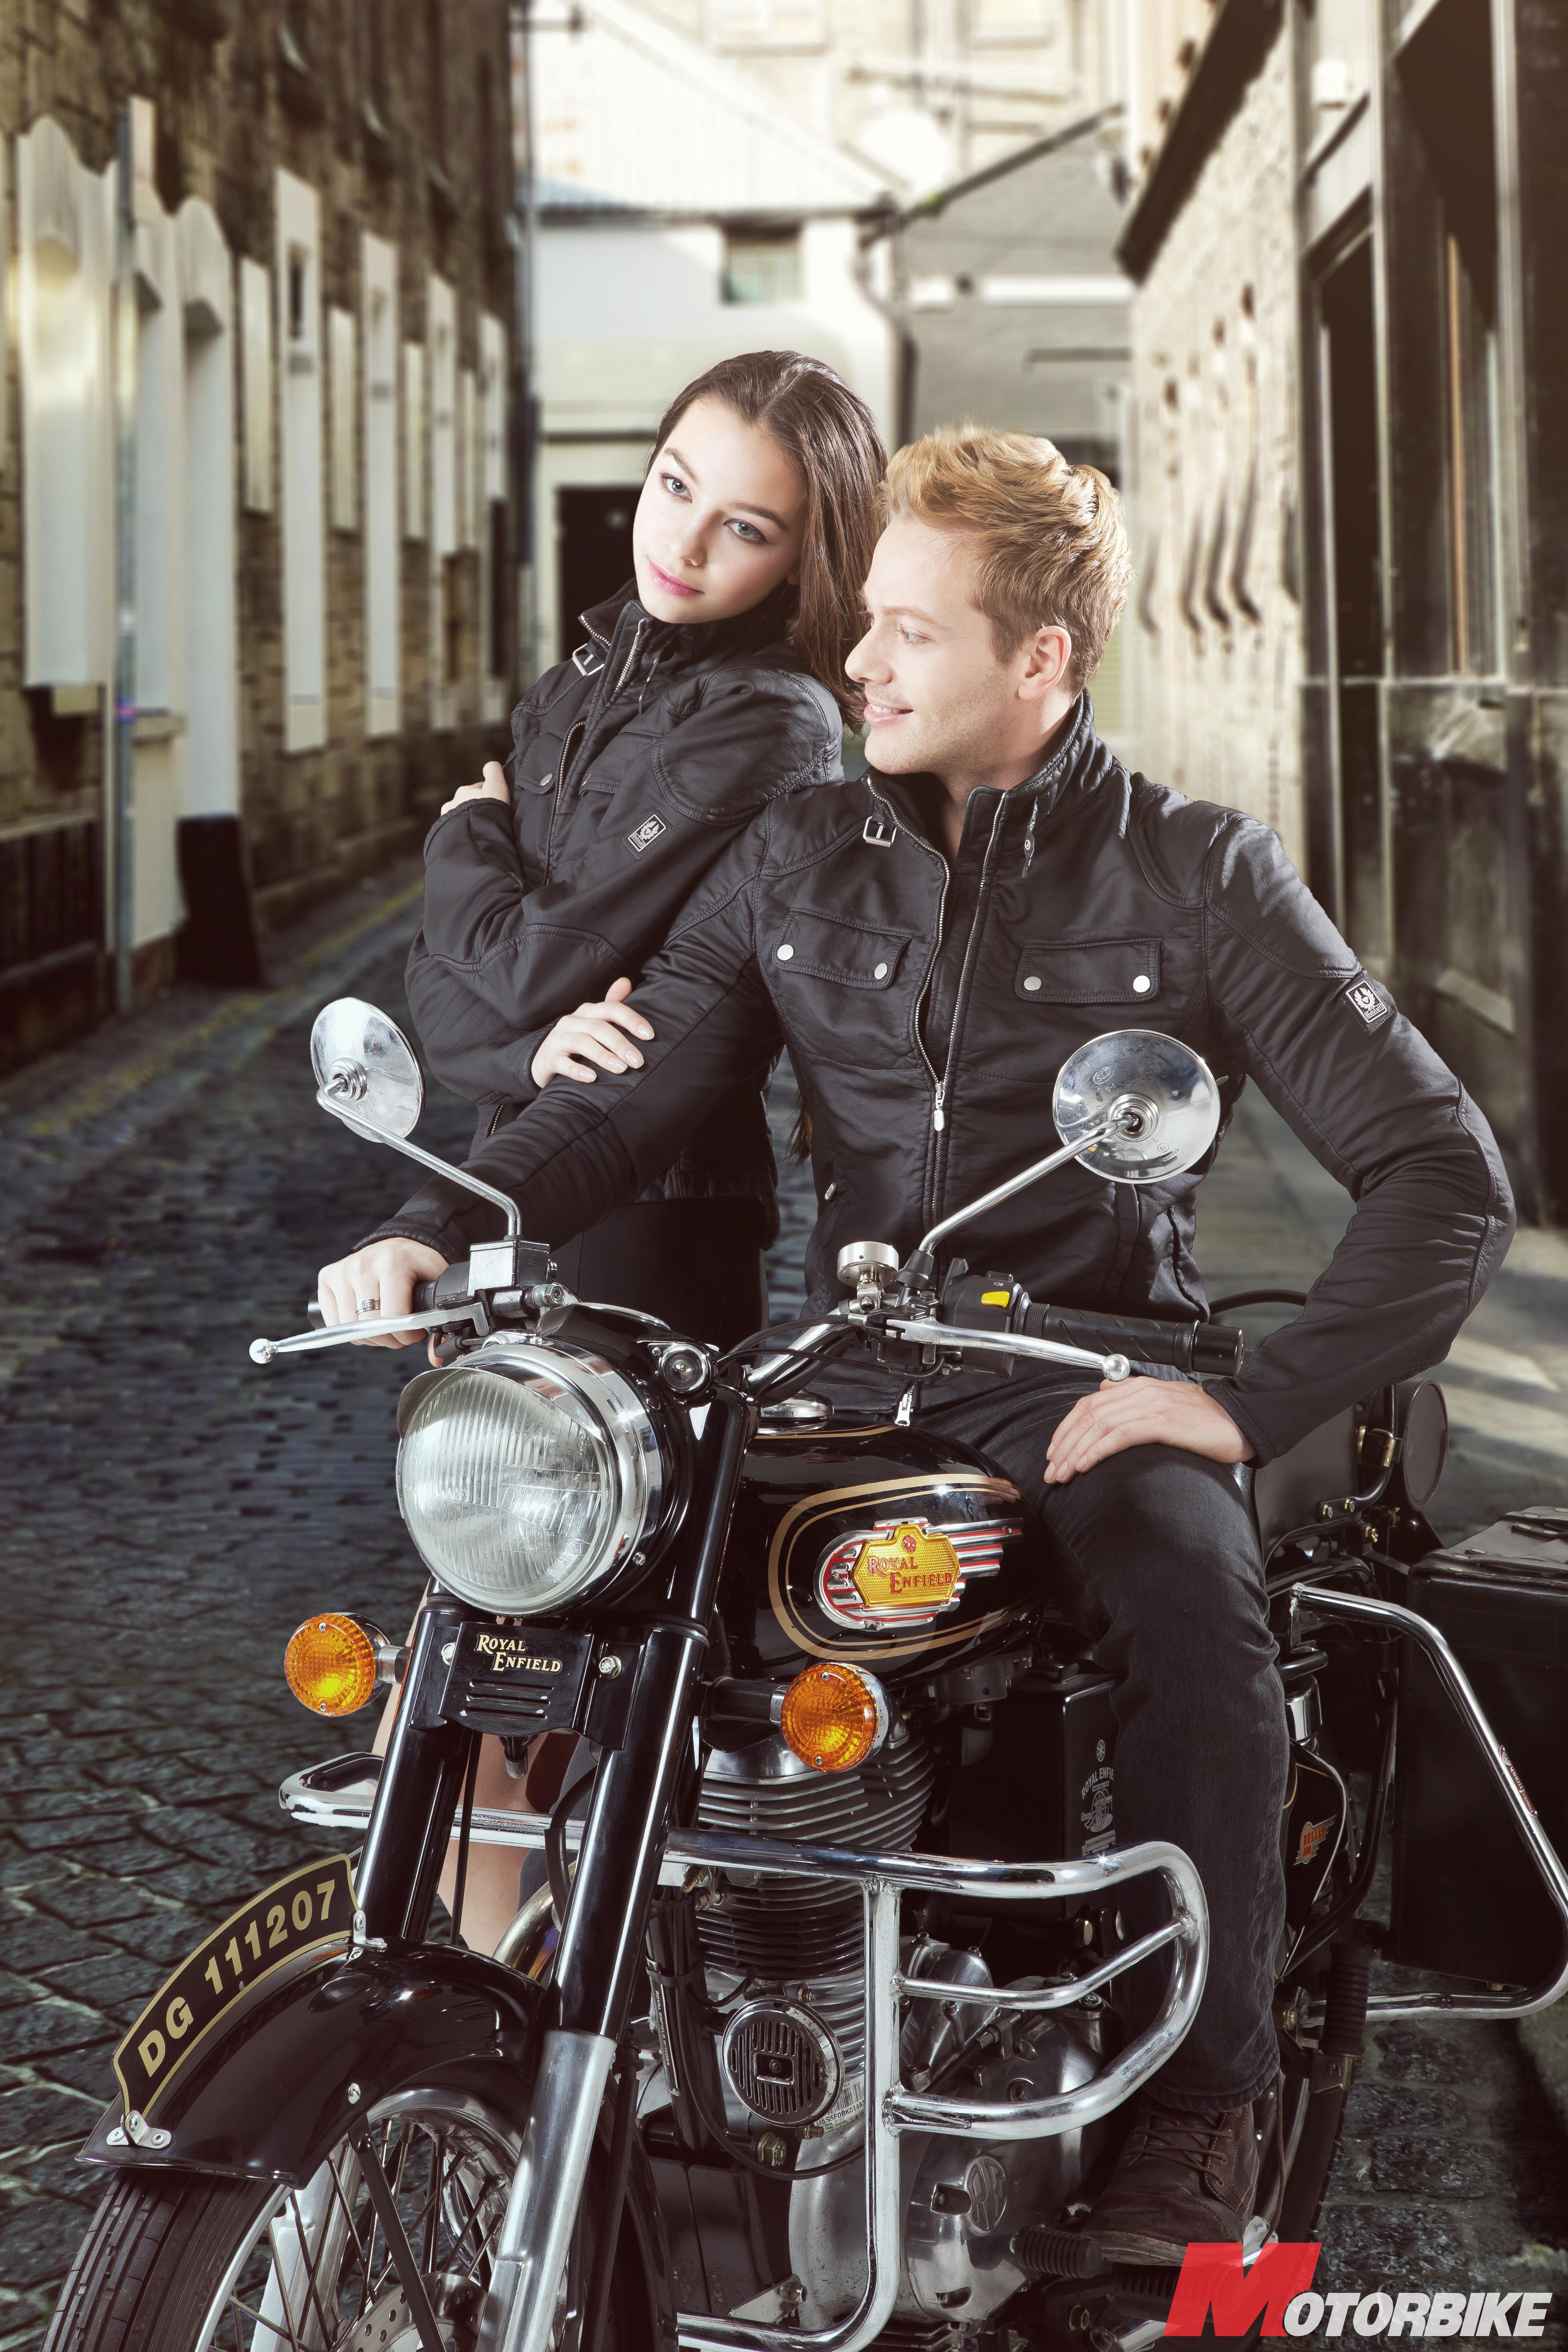 mag Motorbike-Corea (2)